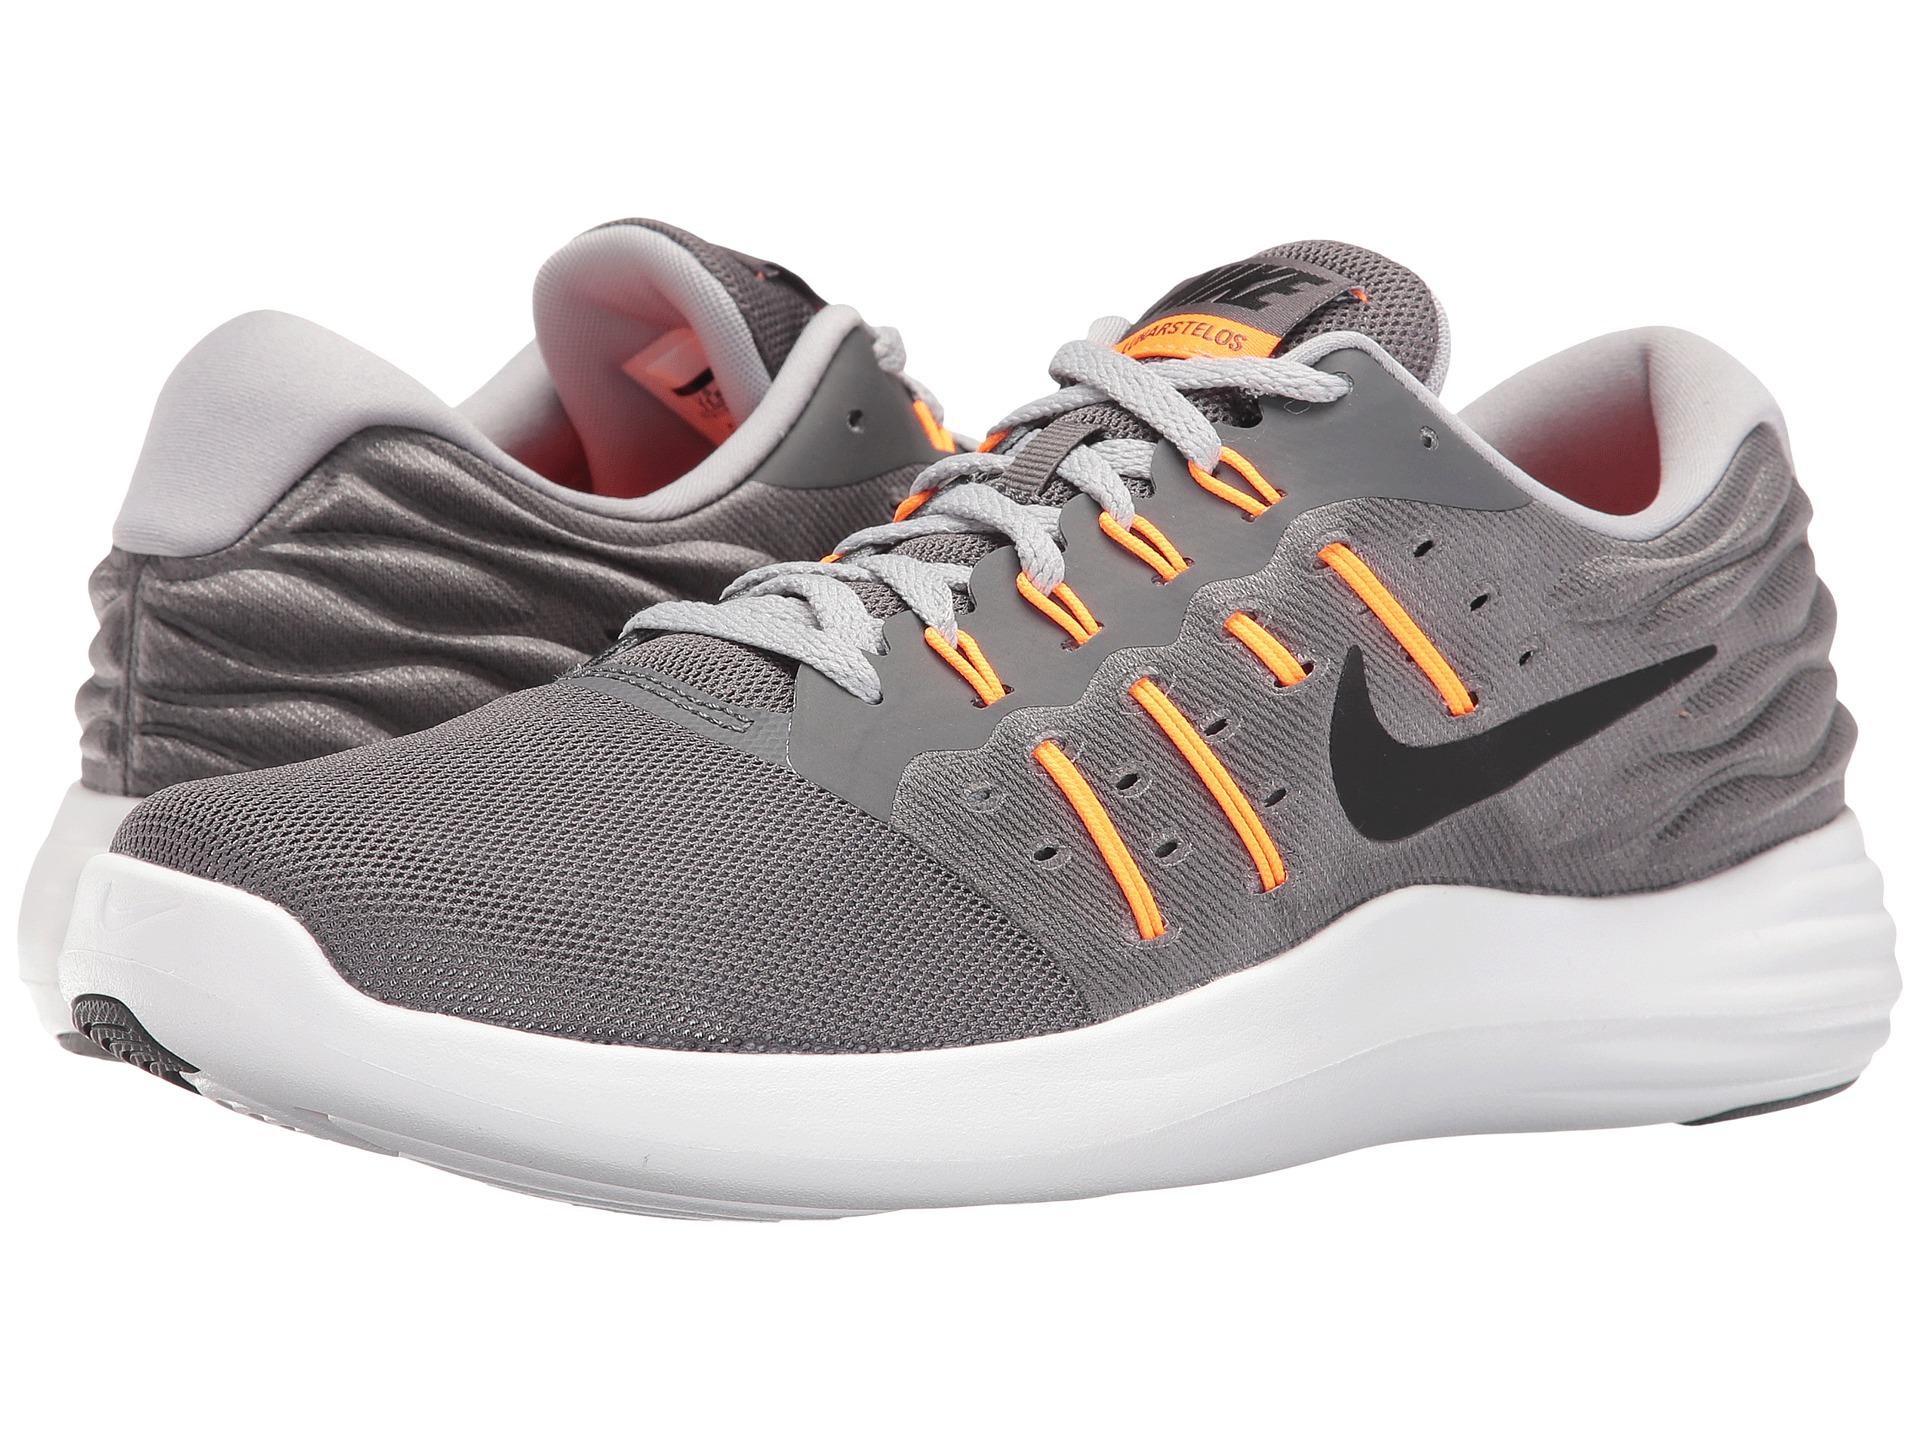 6c89fba1d71c ... Running Shoes 7.5 nike free tr flyknit 5.0 grey silver ... nike  lunarstelos zappos nike ...